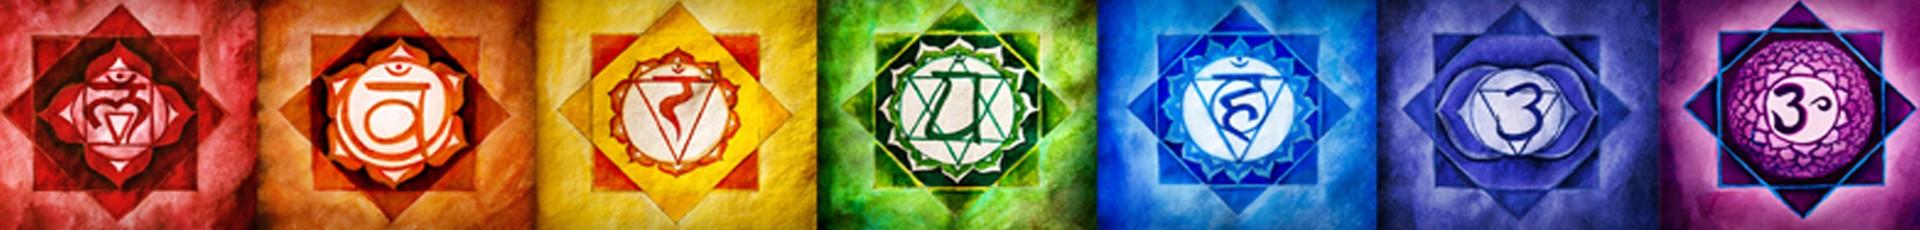 Yin-Yoga-and-Chakras-Course